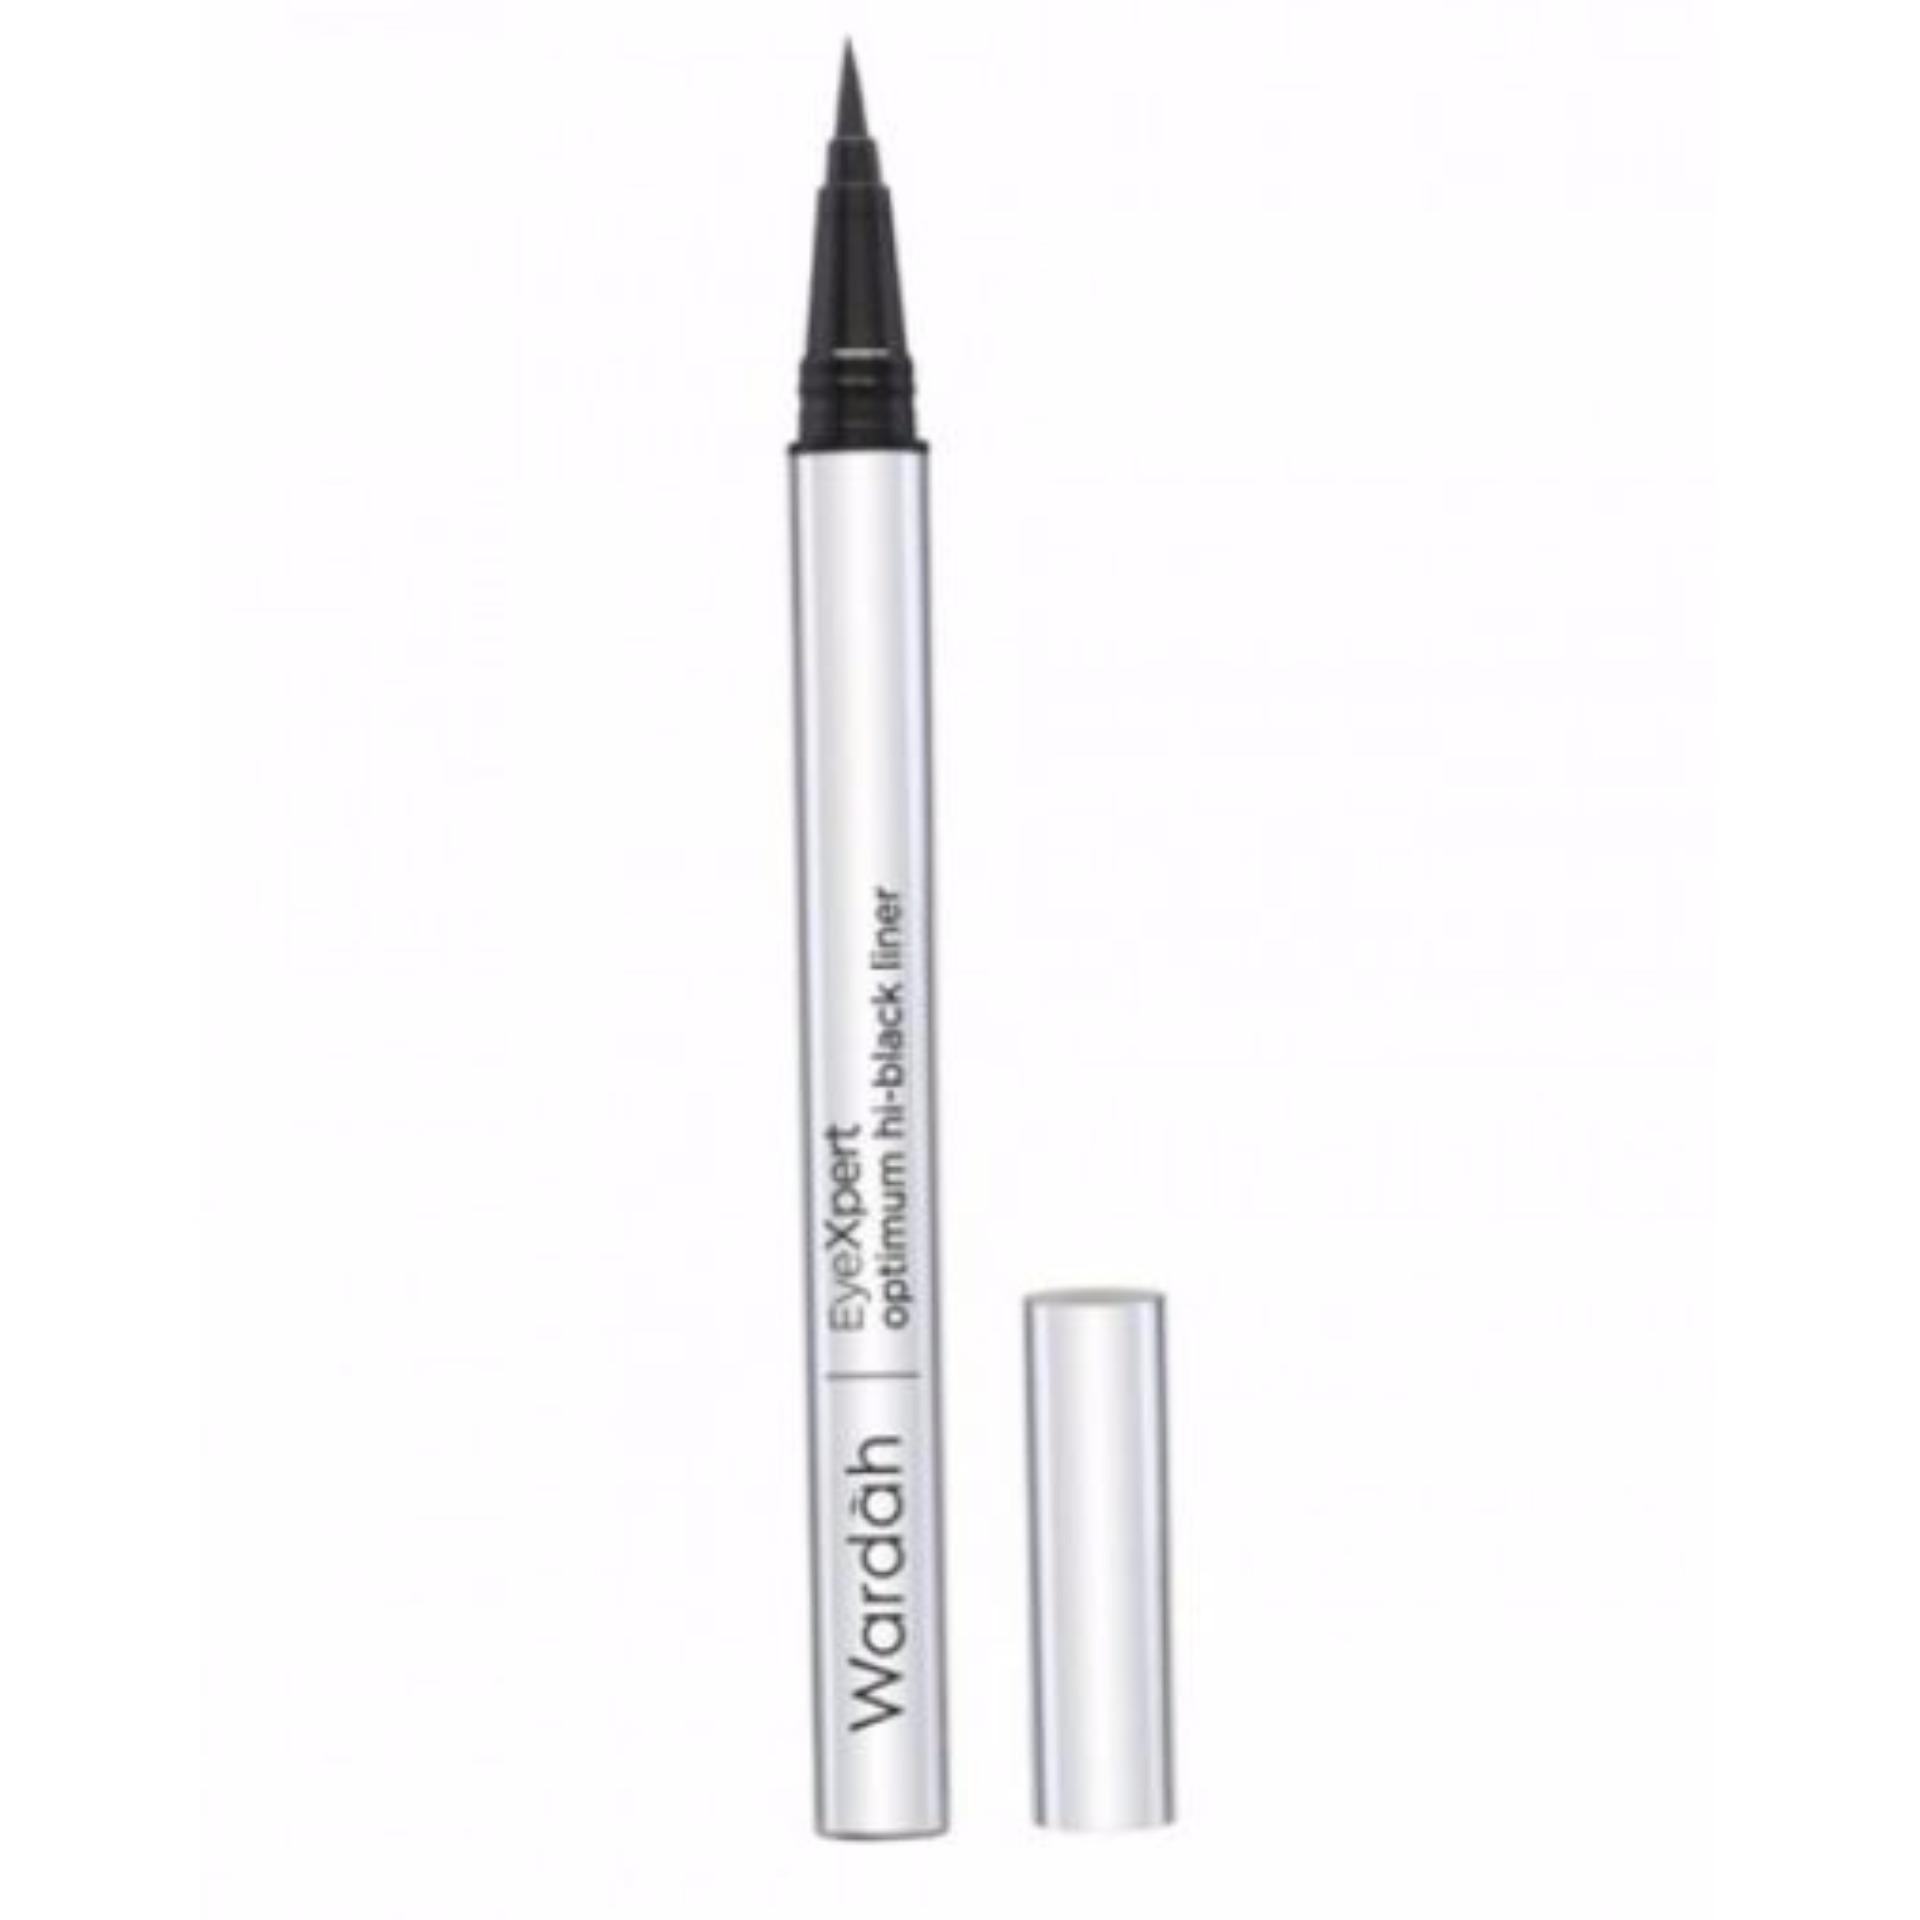 Daftar Harga Wardah Eyexpert Optimum Eyeliner Pen Eye Liner Spidol